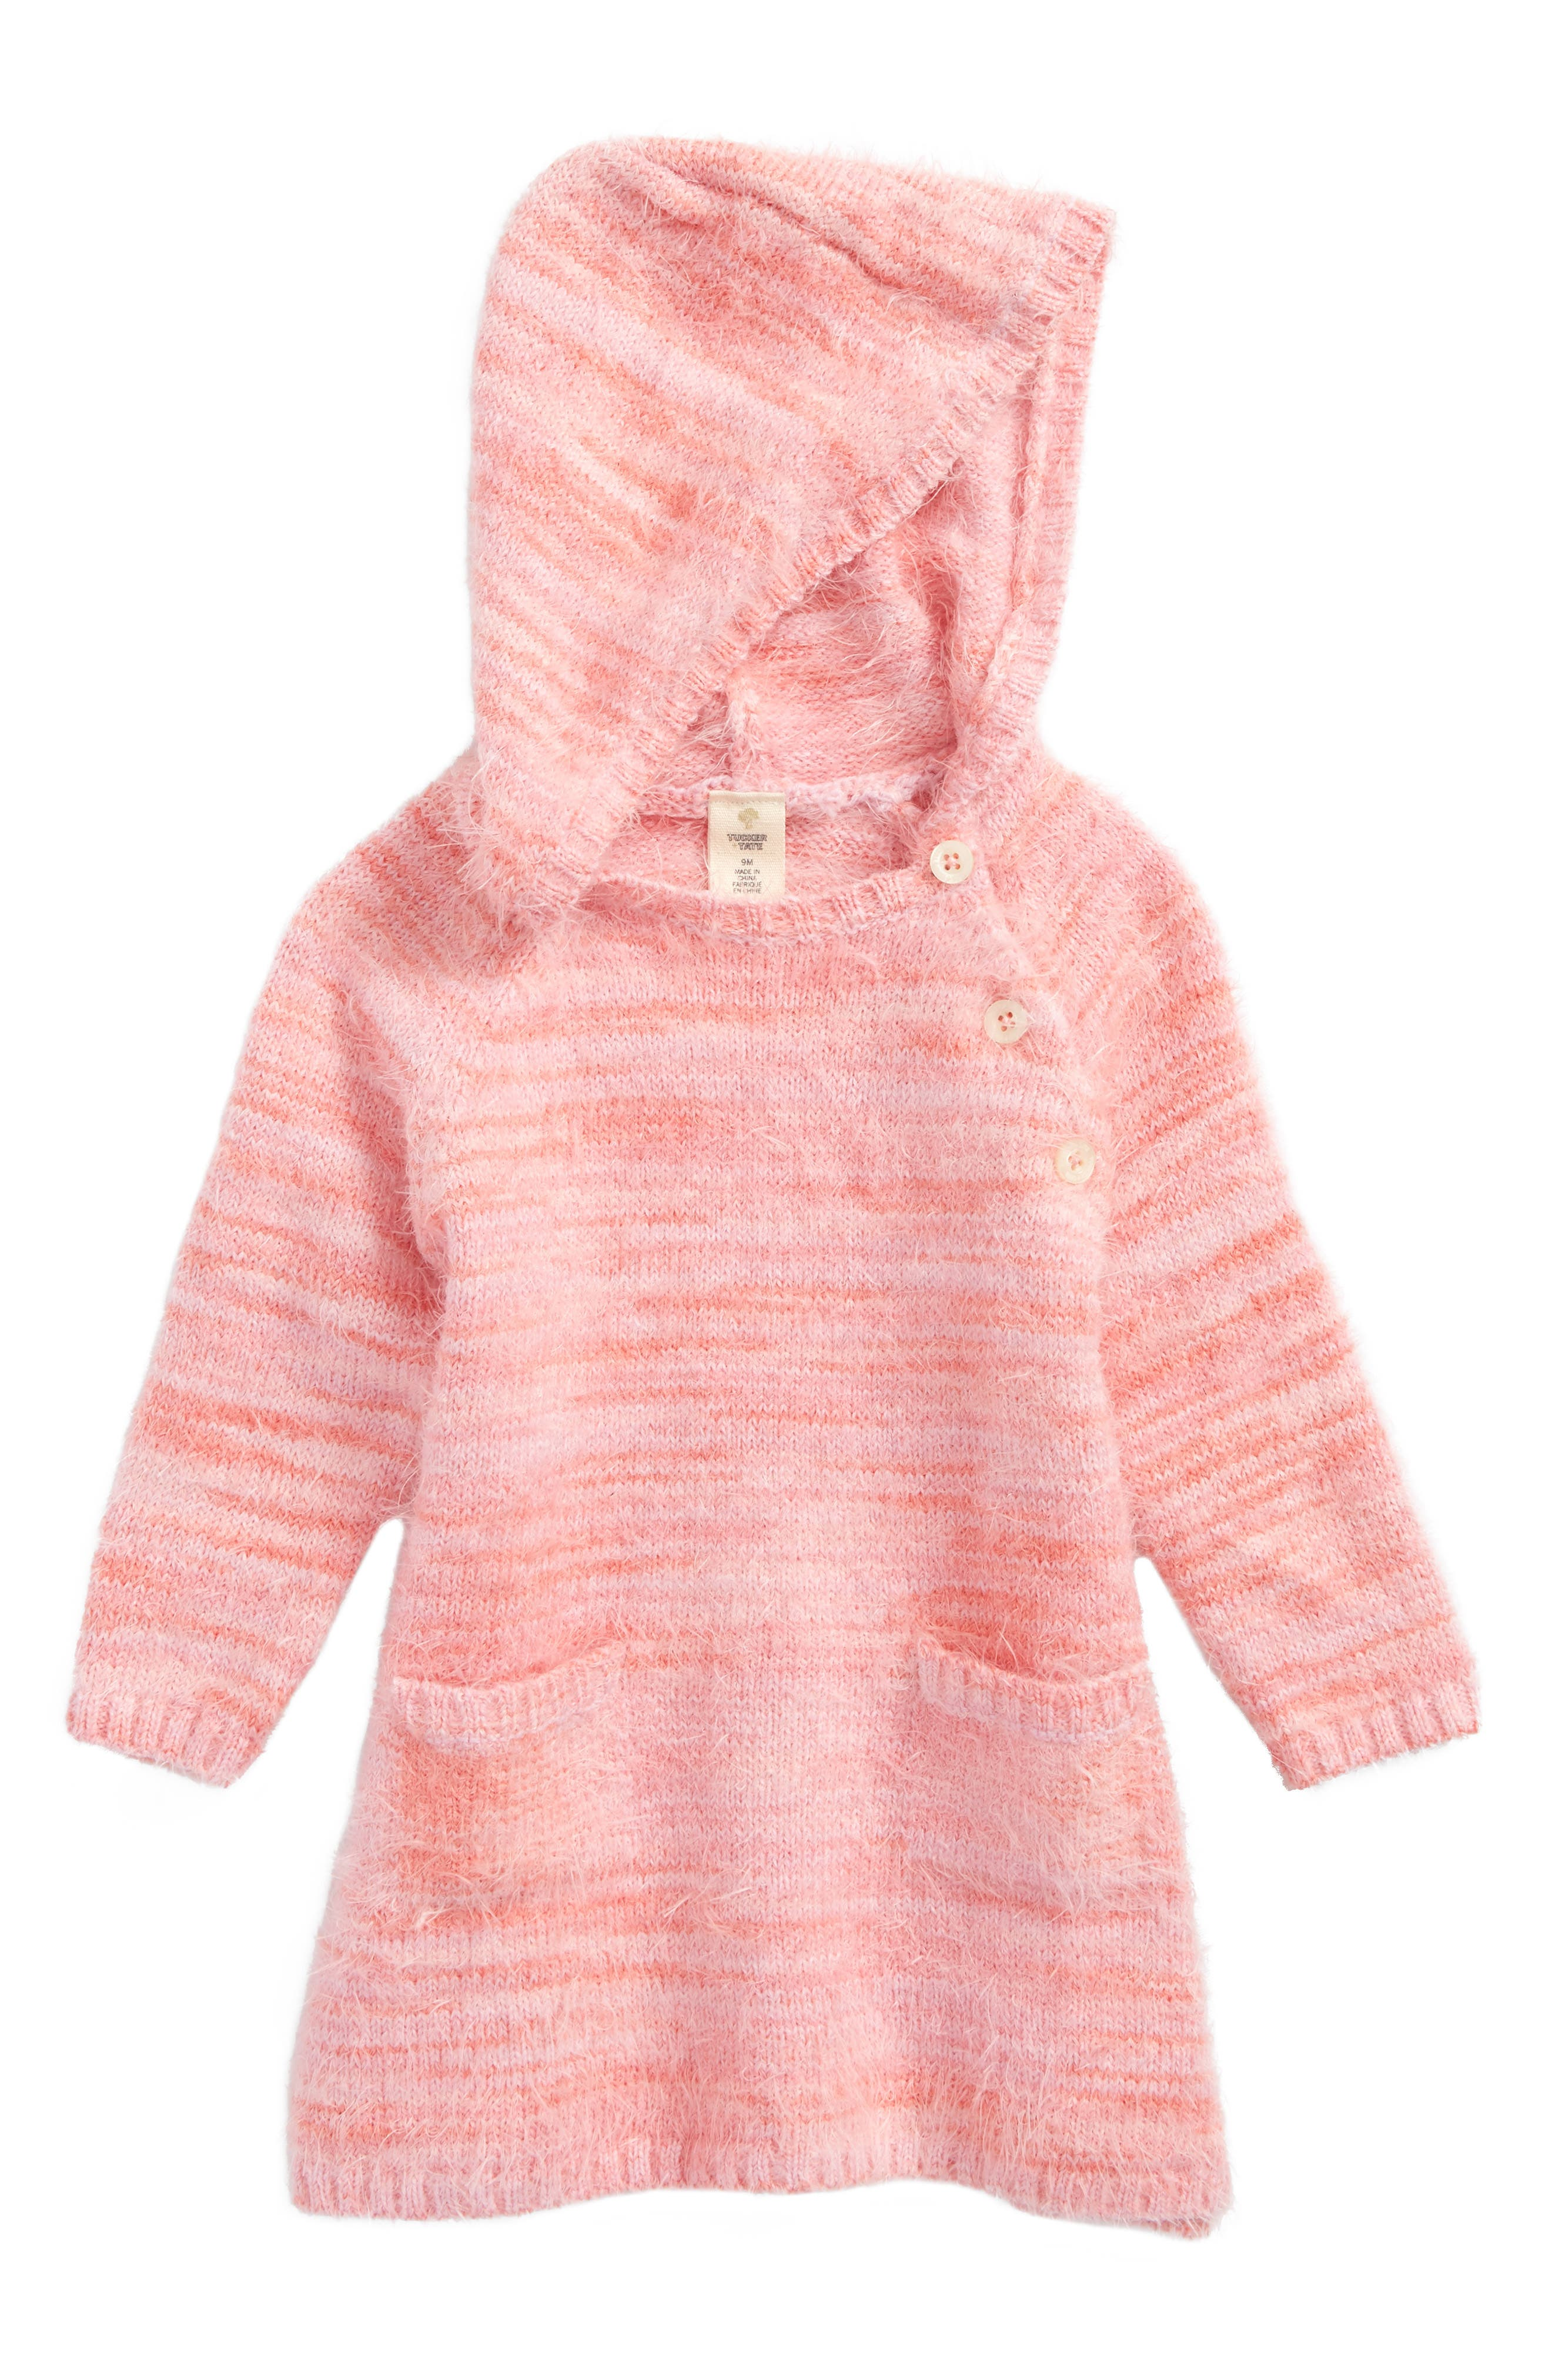 Tucker + Tate Fuzzy Hooded Sweater Dress (Baby Girls)